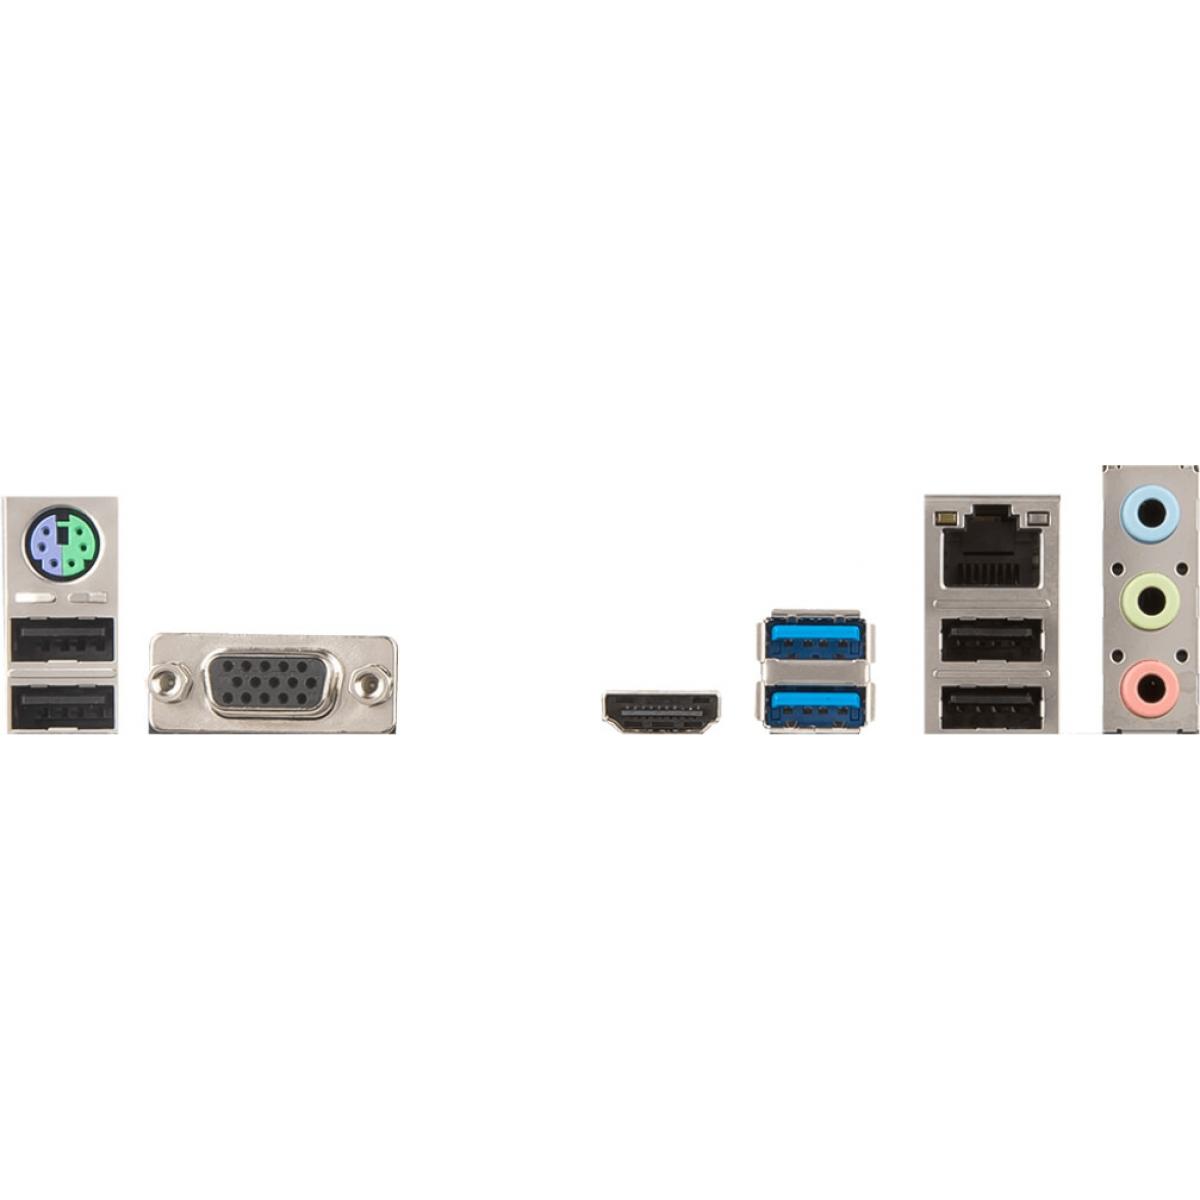 Placa Mãe MSI H310M PRO-VH, Chipset H310, Intel LGA 1151, mATX, DDR4